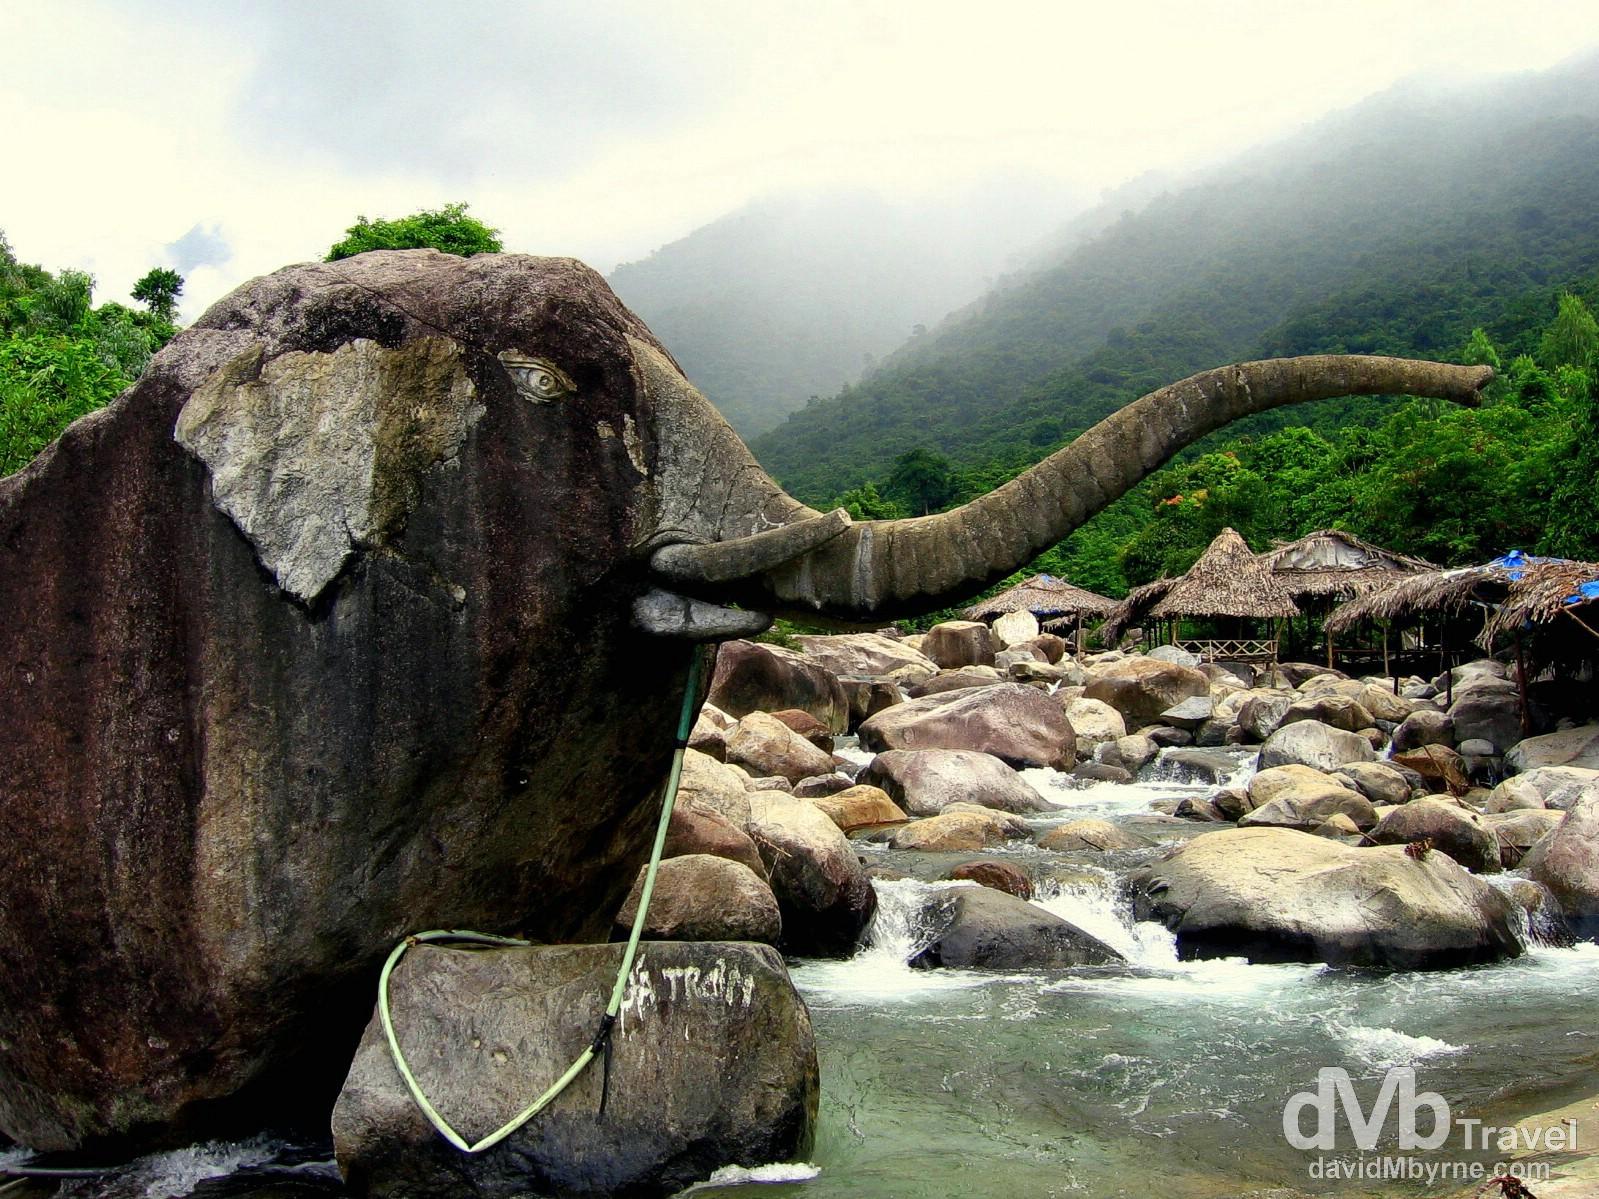 Suoi Voi (Elephant springs) in Bach Ma National Park, Central Vietnam. September 8th, 2005.